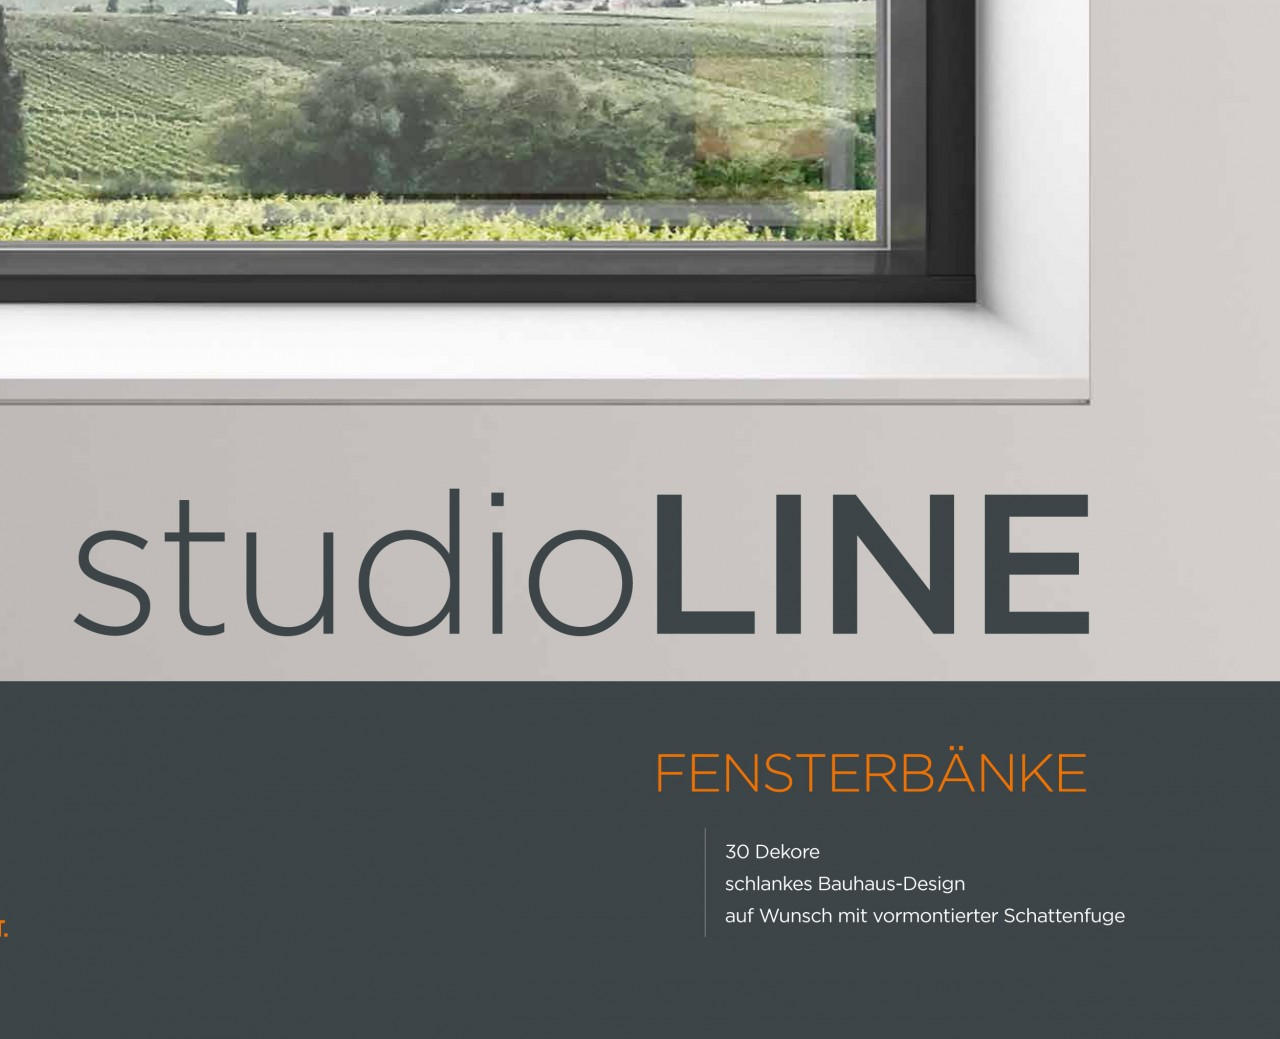 Fensterbank / Fensterbänke Alu | Werzalit | Innen Außen | Attika ...